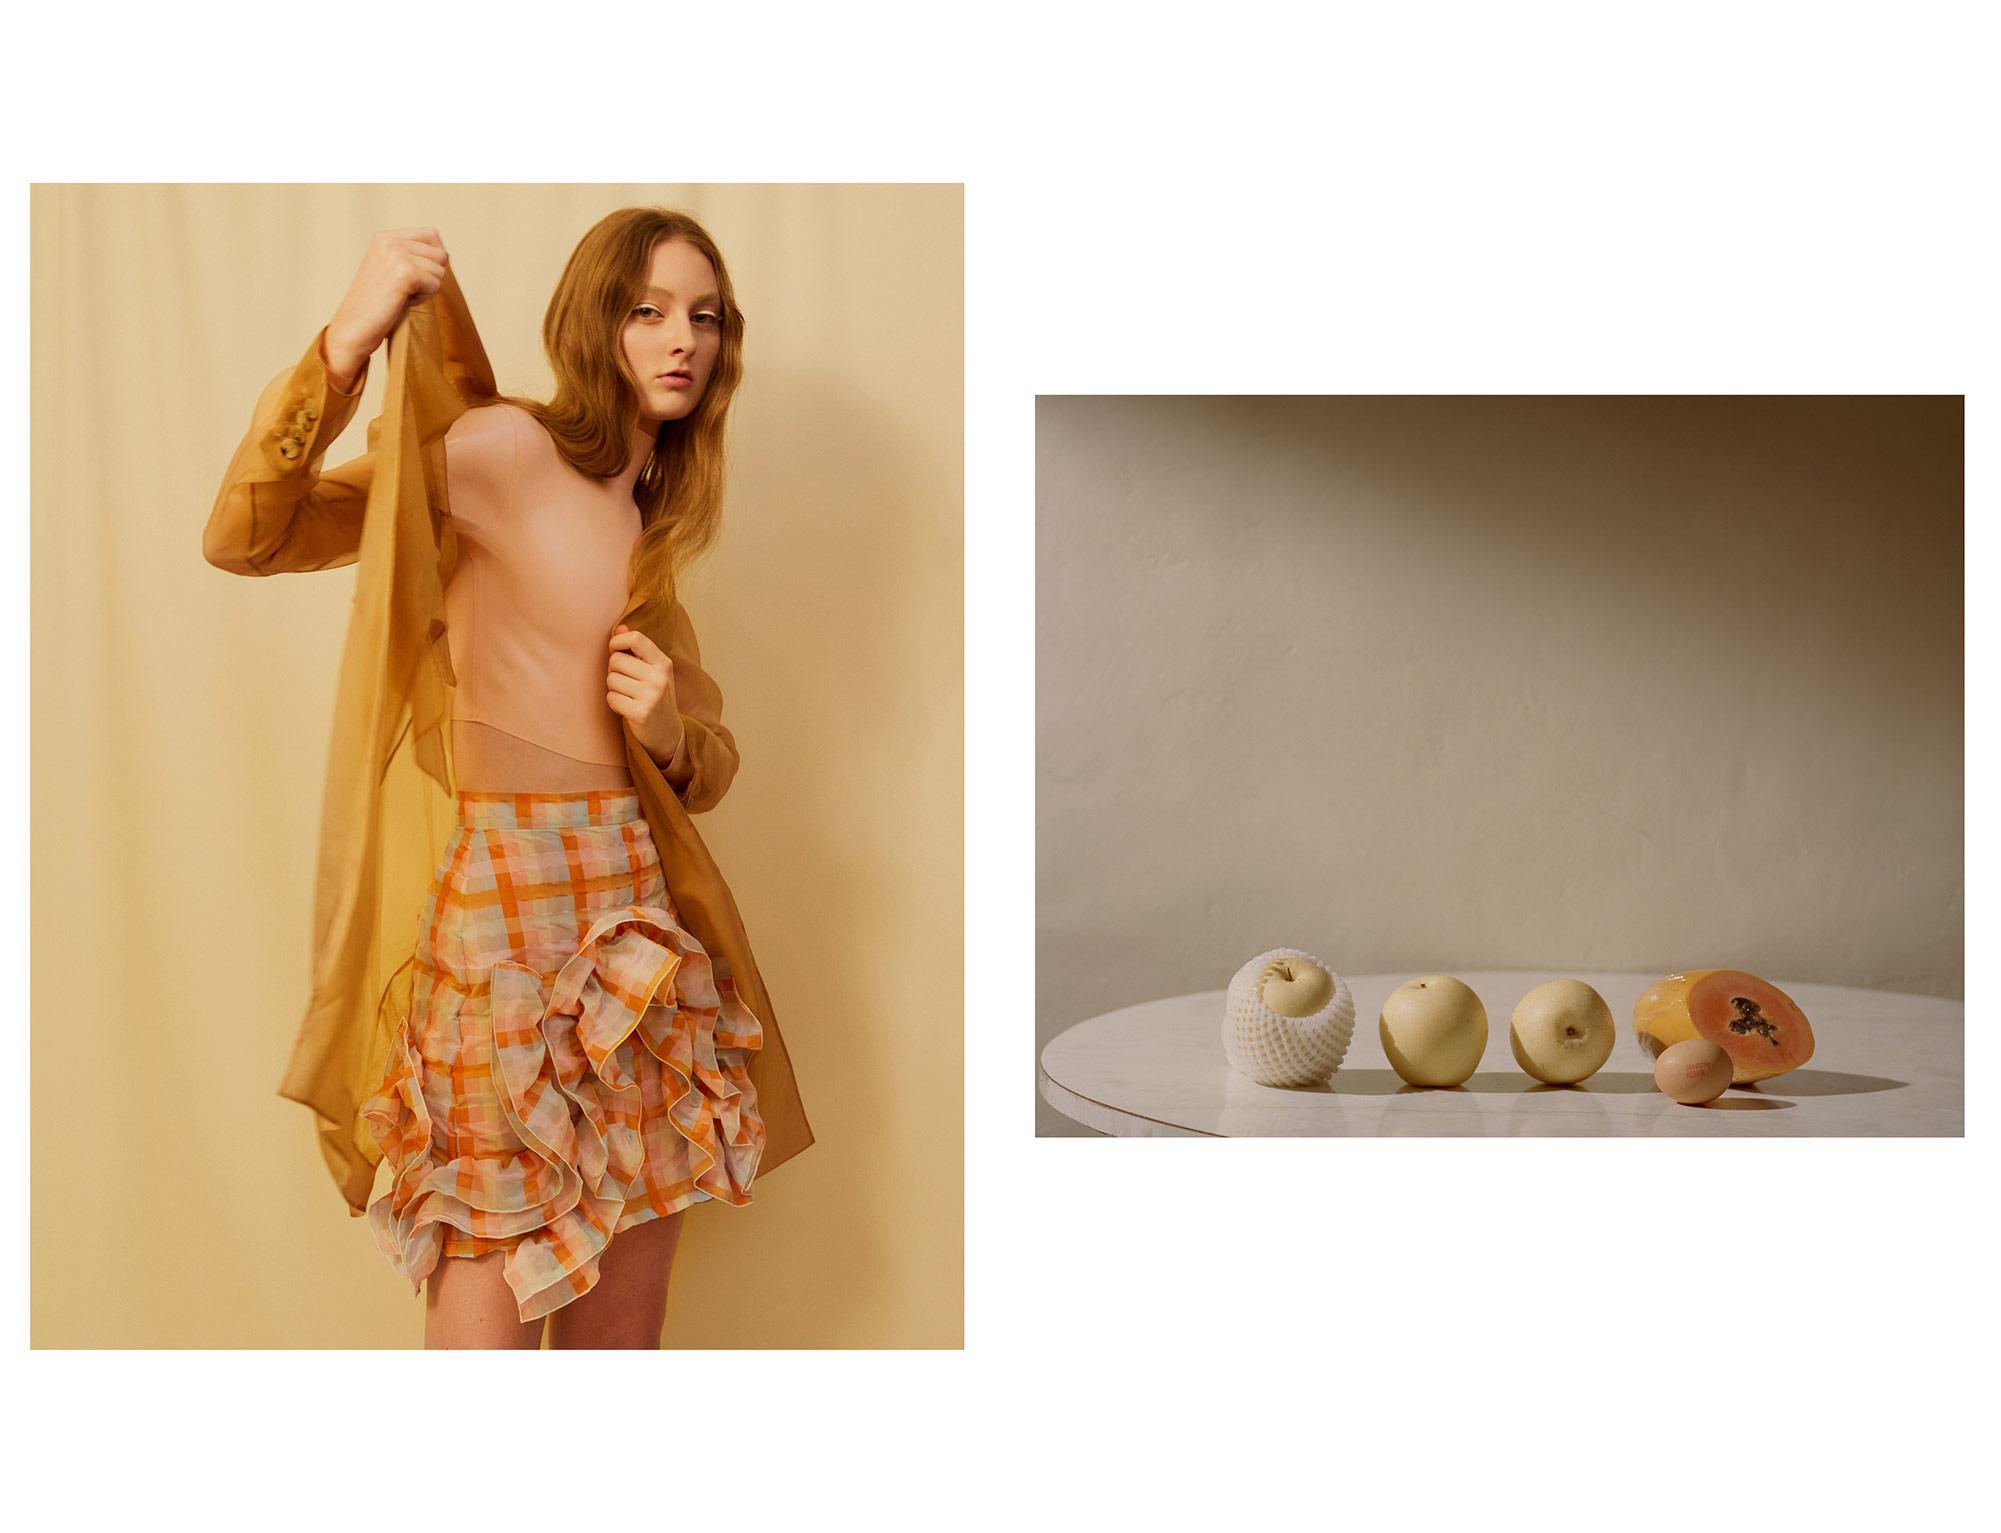 2018_03_03_Fruit_Girl_Oyster_Magzaine_Final_JPG_02.jpg